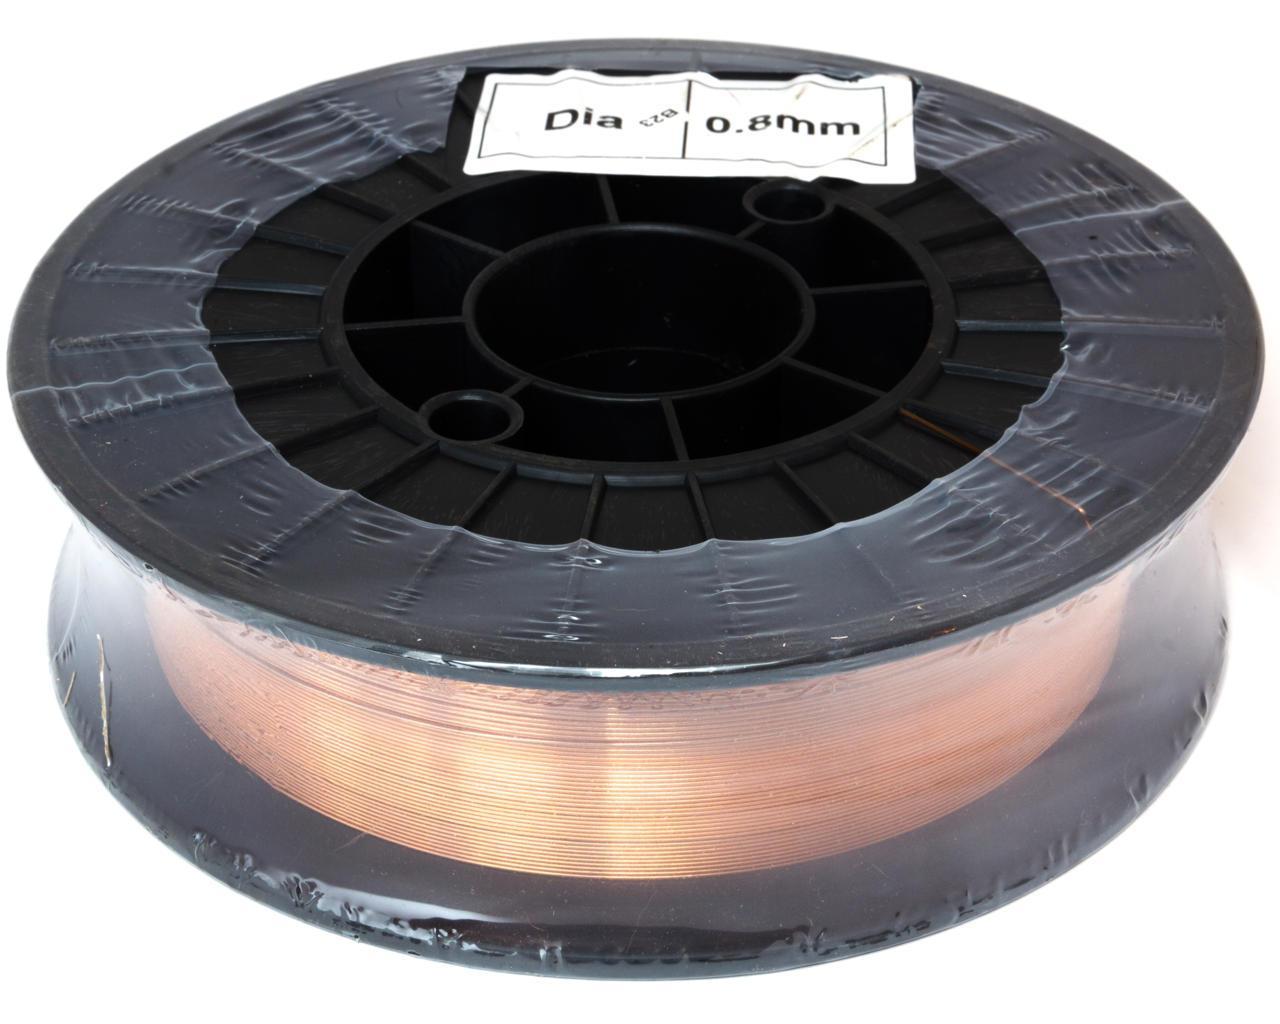 Проволока 2,5 кг 0,8 мм (вес 2,2 кг)